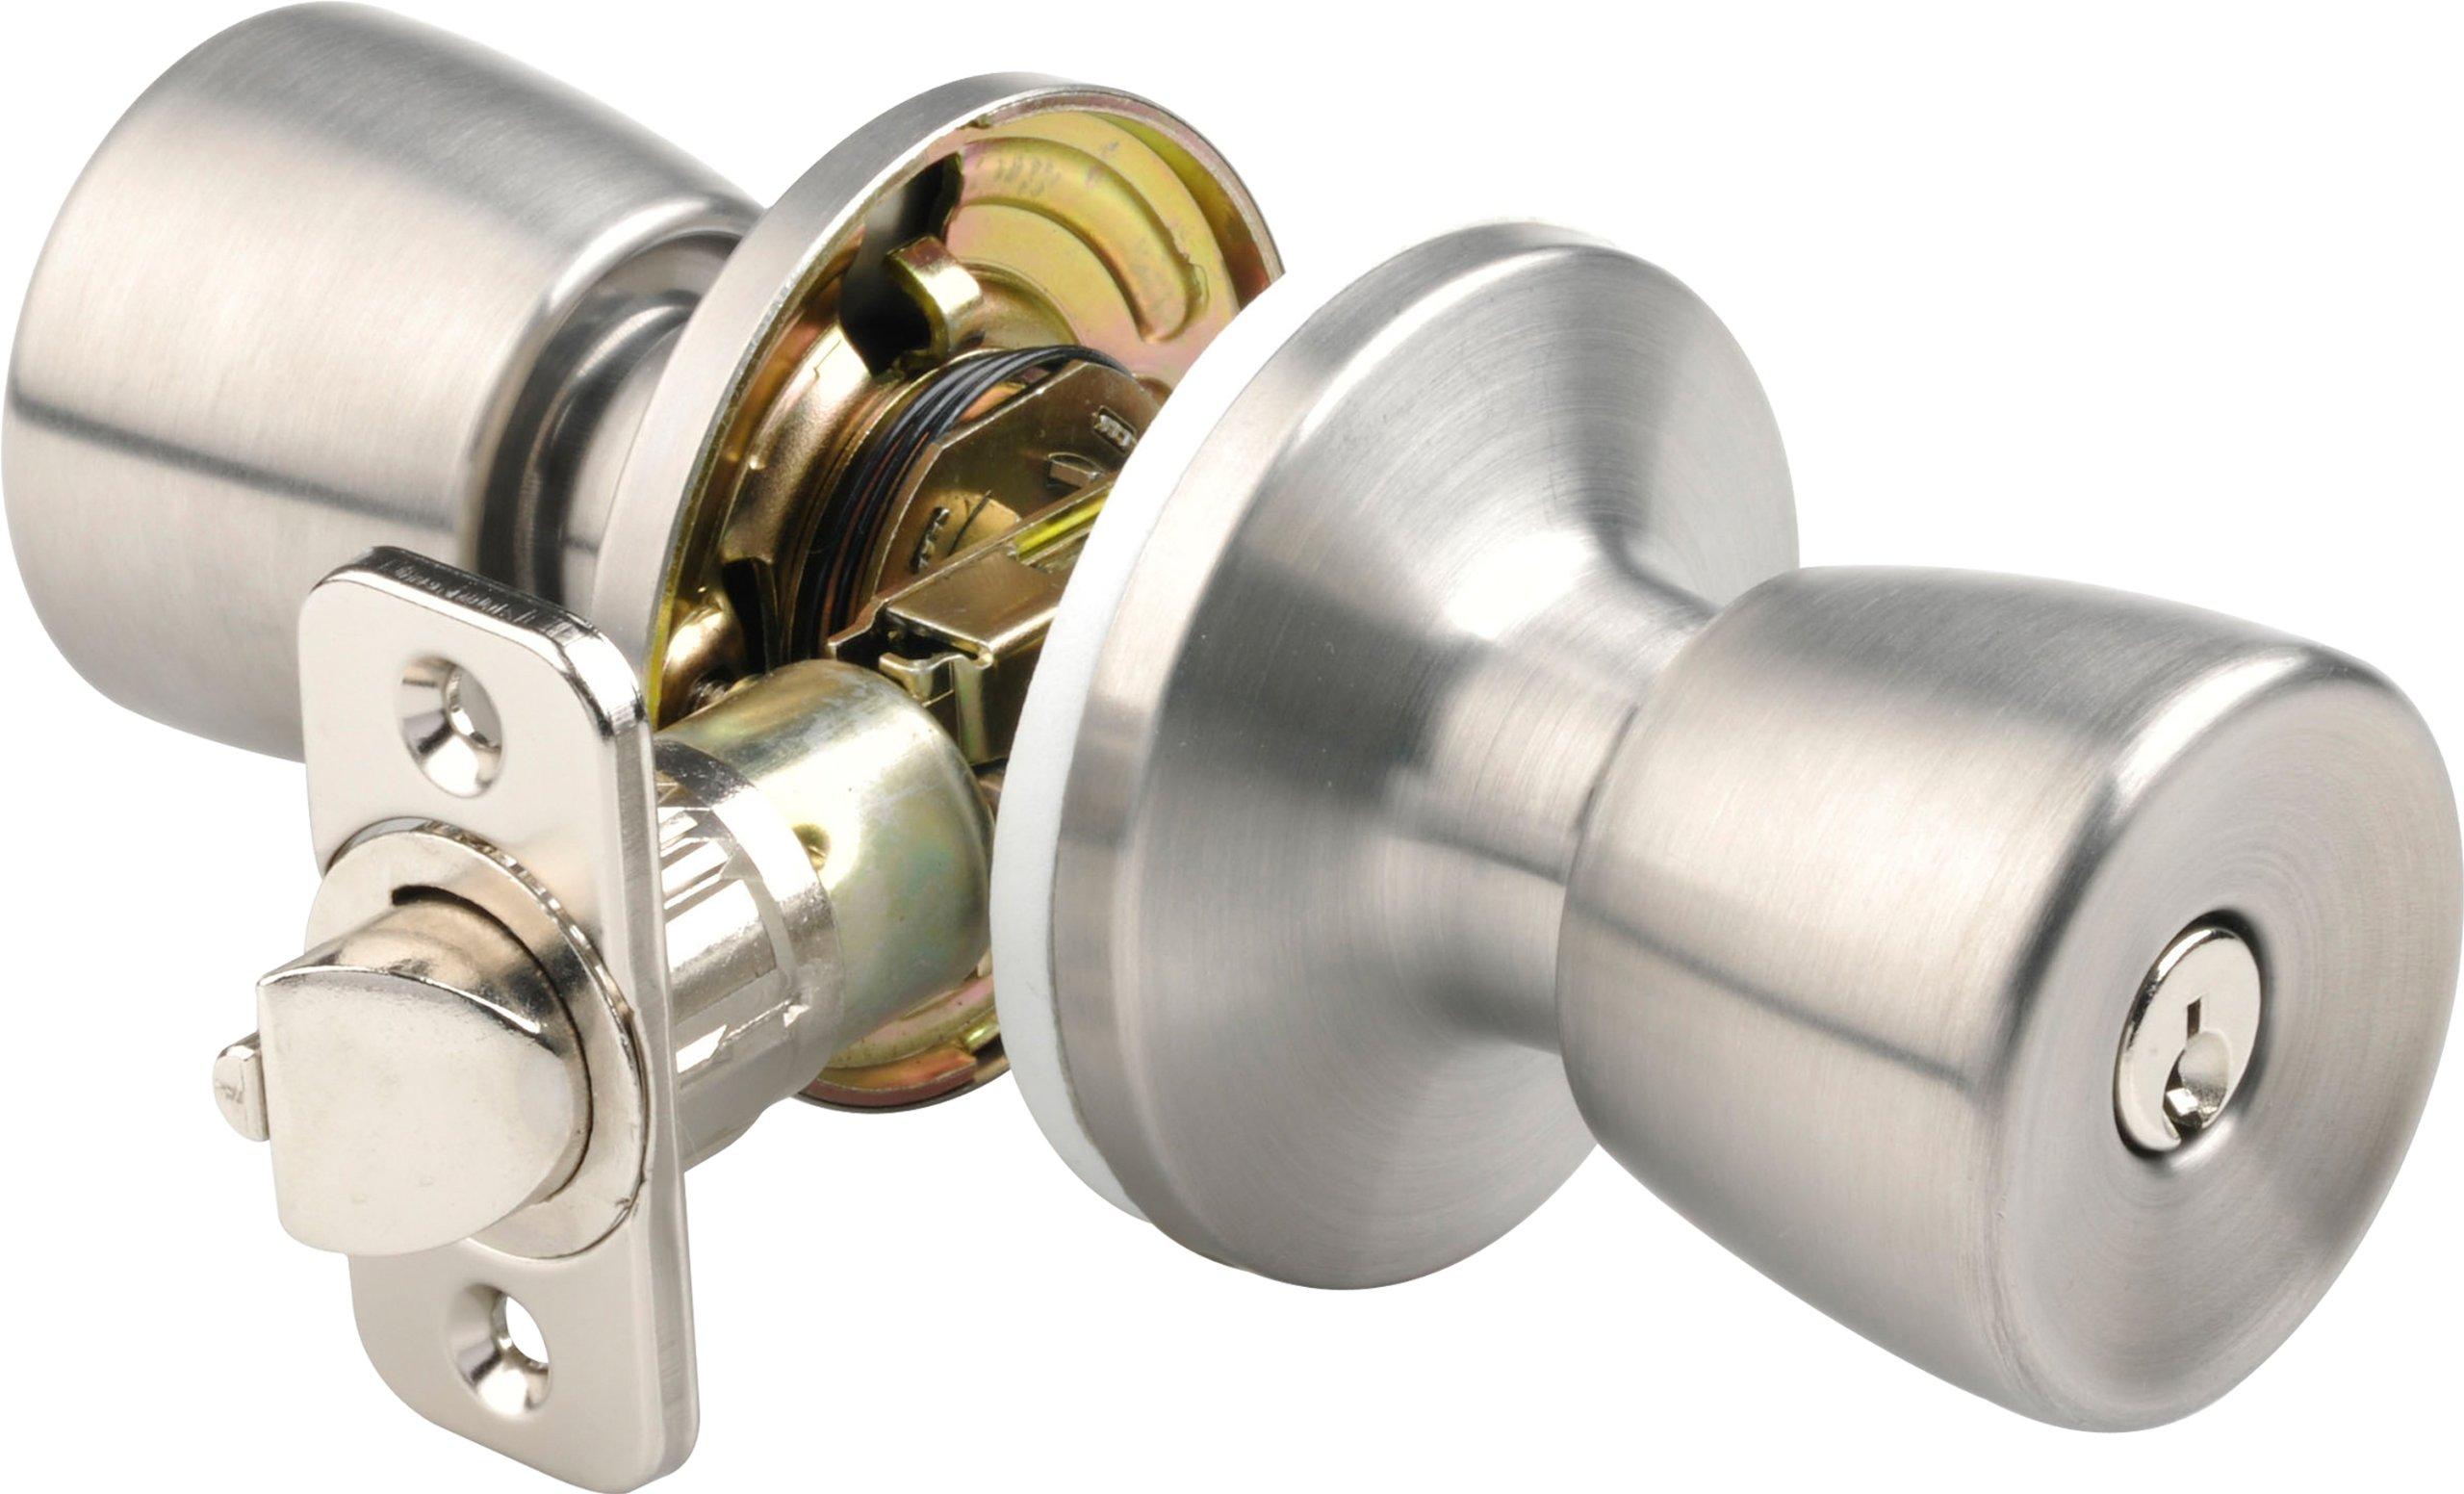 Brinks 2710-130 Mobile Home Keyed Entry Tulip Style Door Knob, Stainless Steel